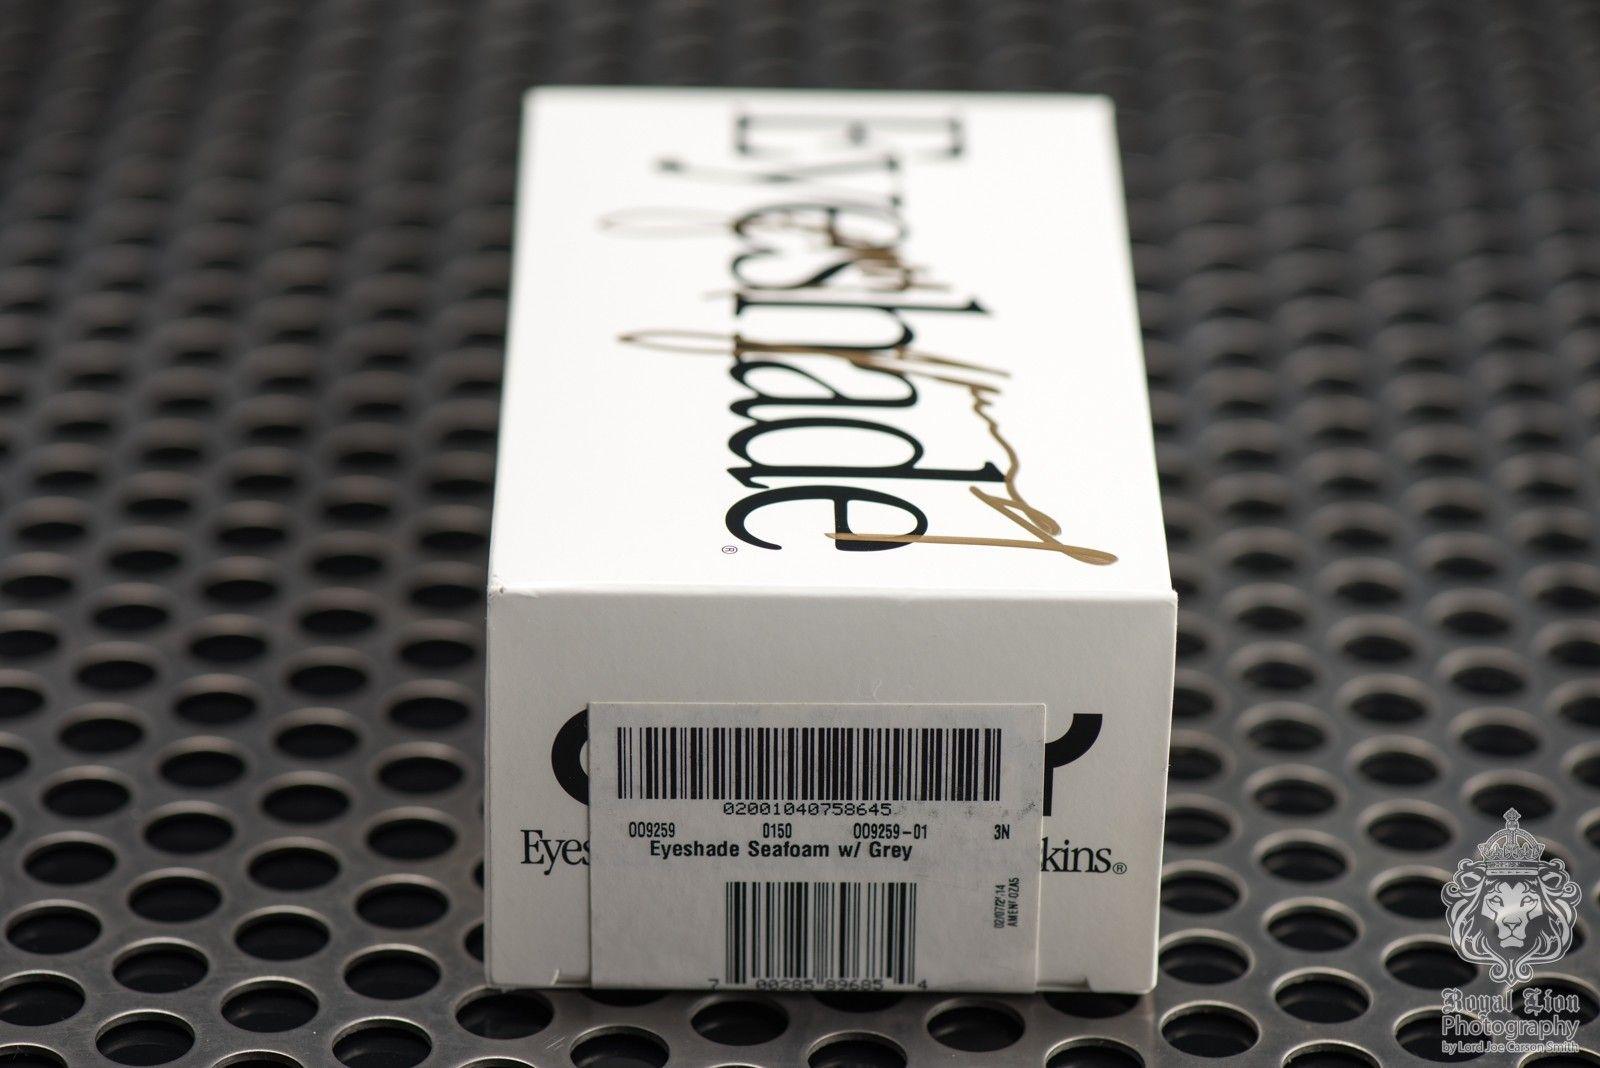 1 of 3 Signed Oakley Heritage Eyeshades by Jim Jannard - Seafoam with Grey Mint in Box - ND8_3473.jpg